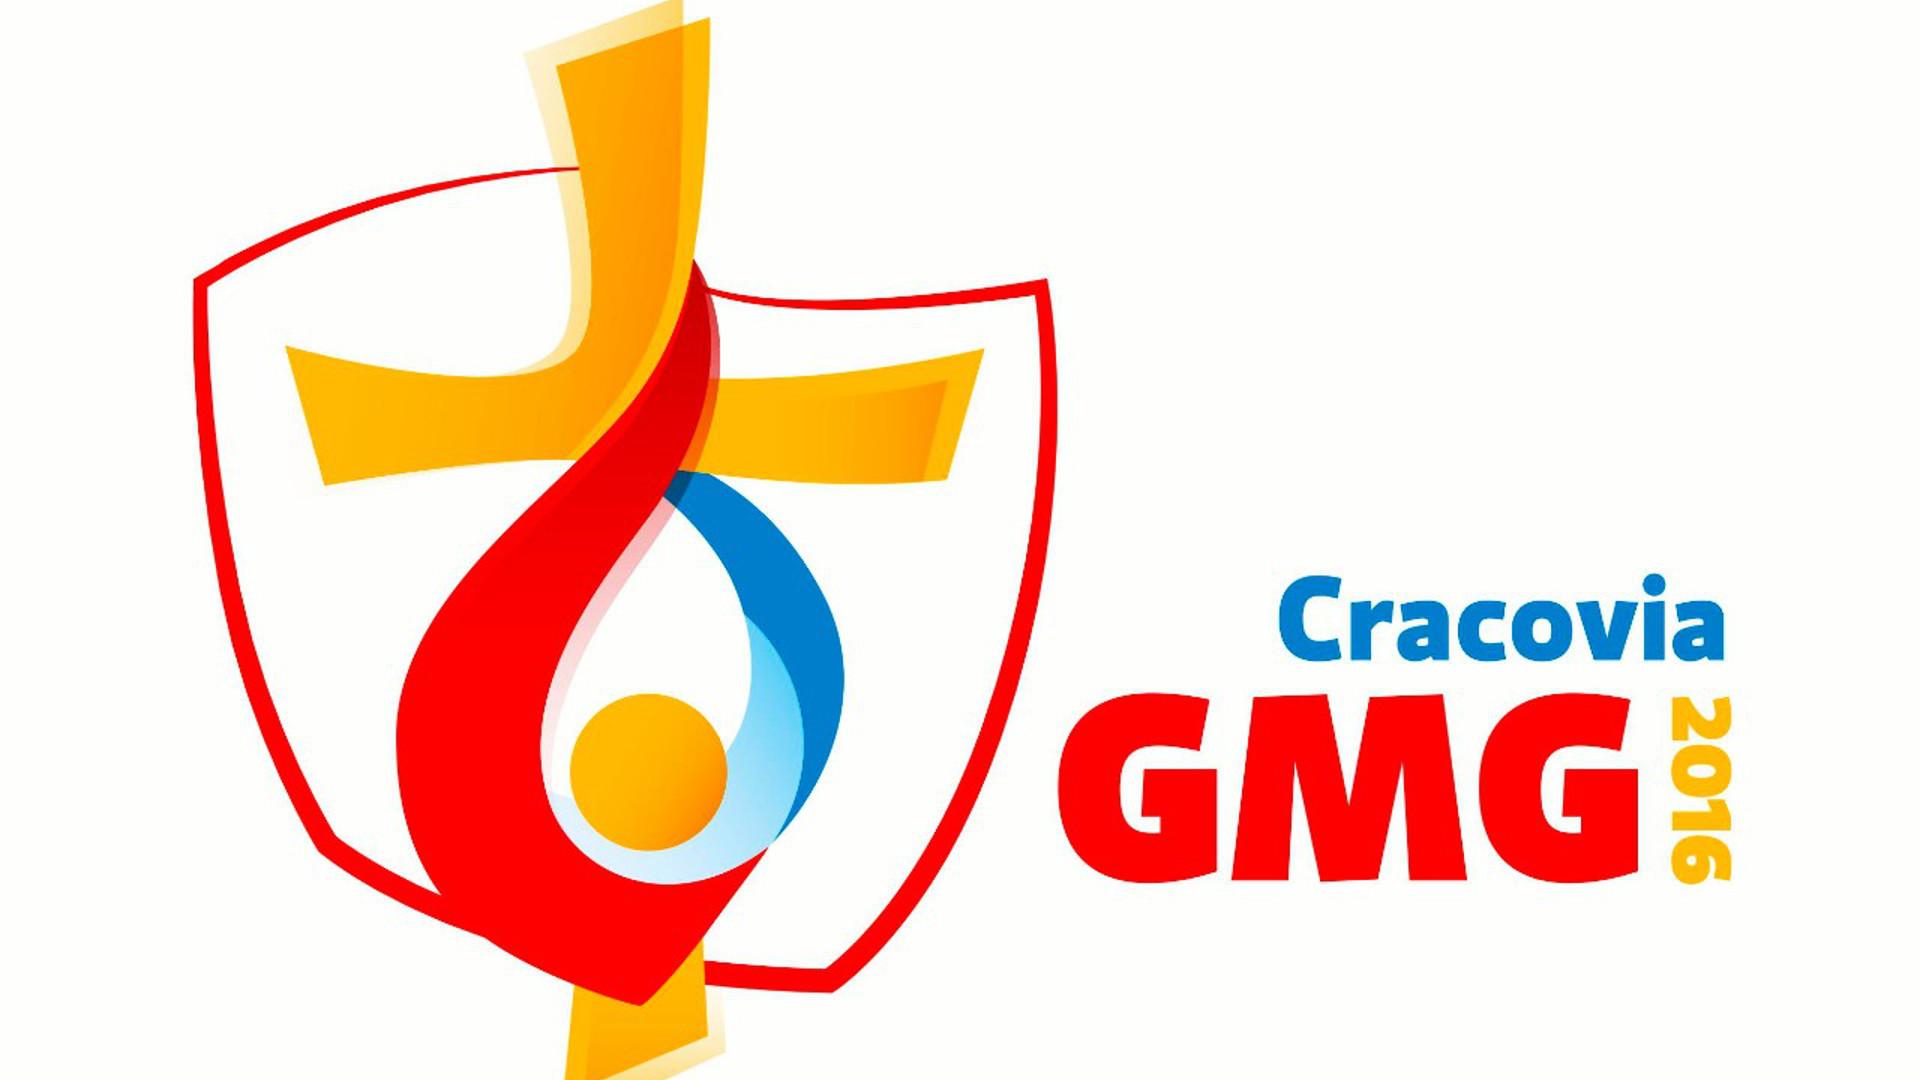 logo-gmg-cracovia-1920x1080